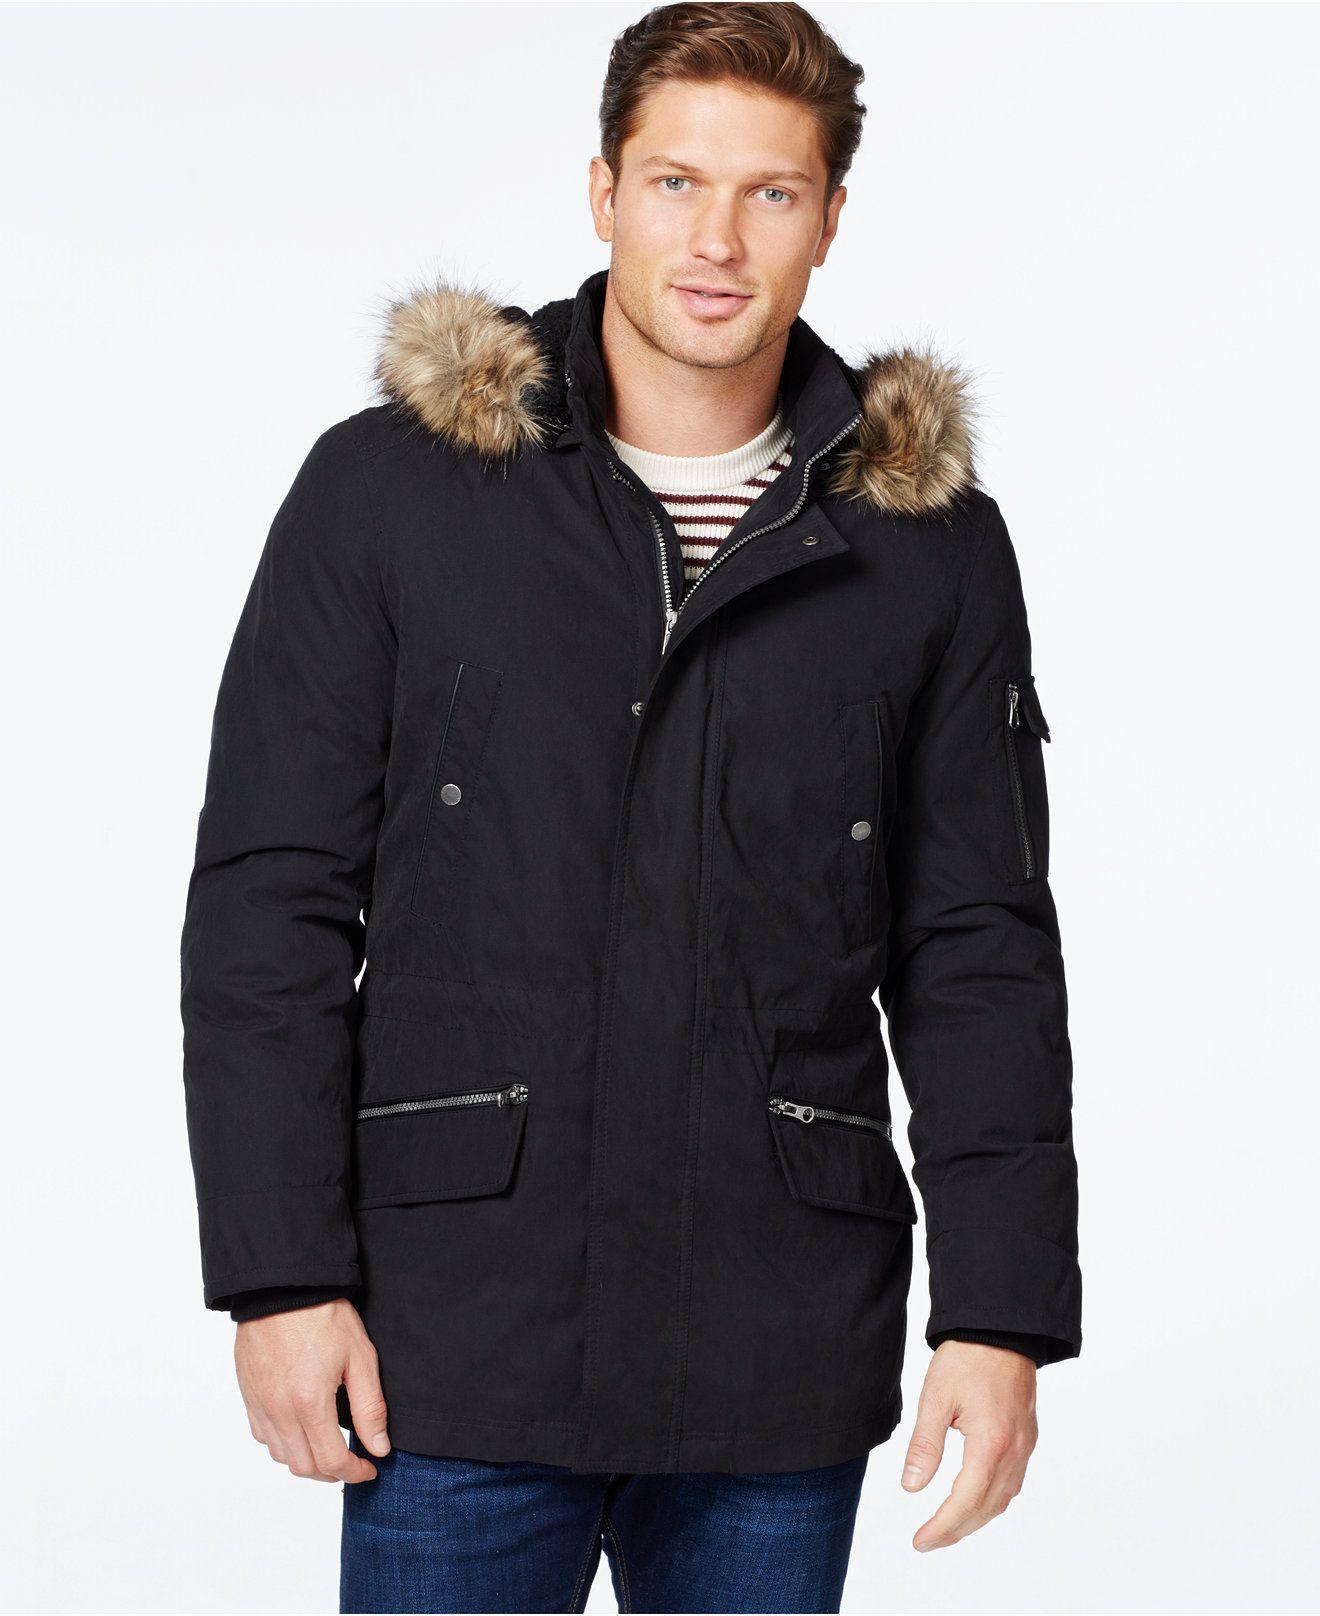 Nautica Parka With Removable Faux Fur Hood Coats Jackets Men Macy S Mens Parka Jacket Faux Fur Parka Fur Hood Jacket [ 1616 x 1320 Pixel ]